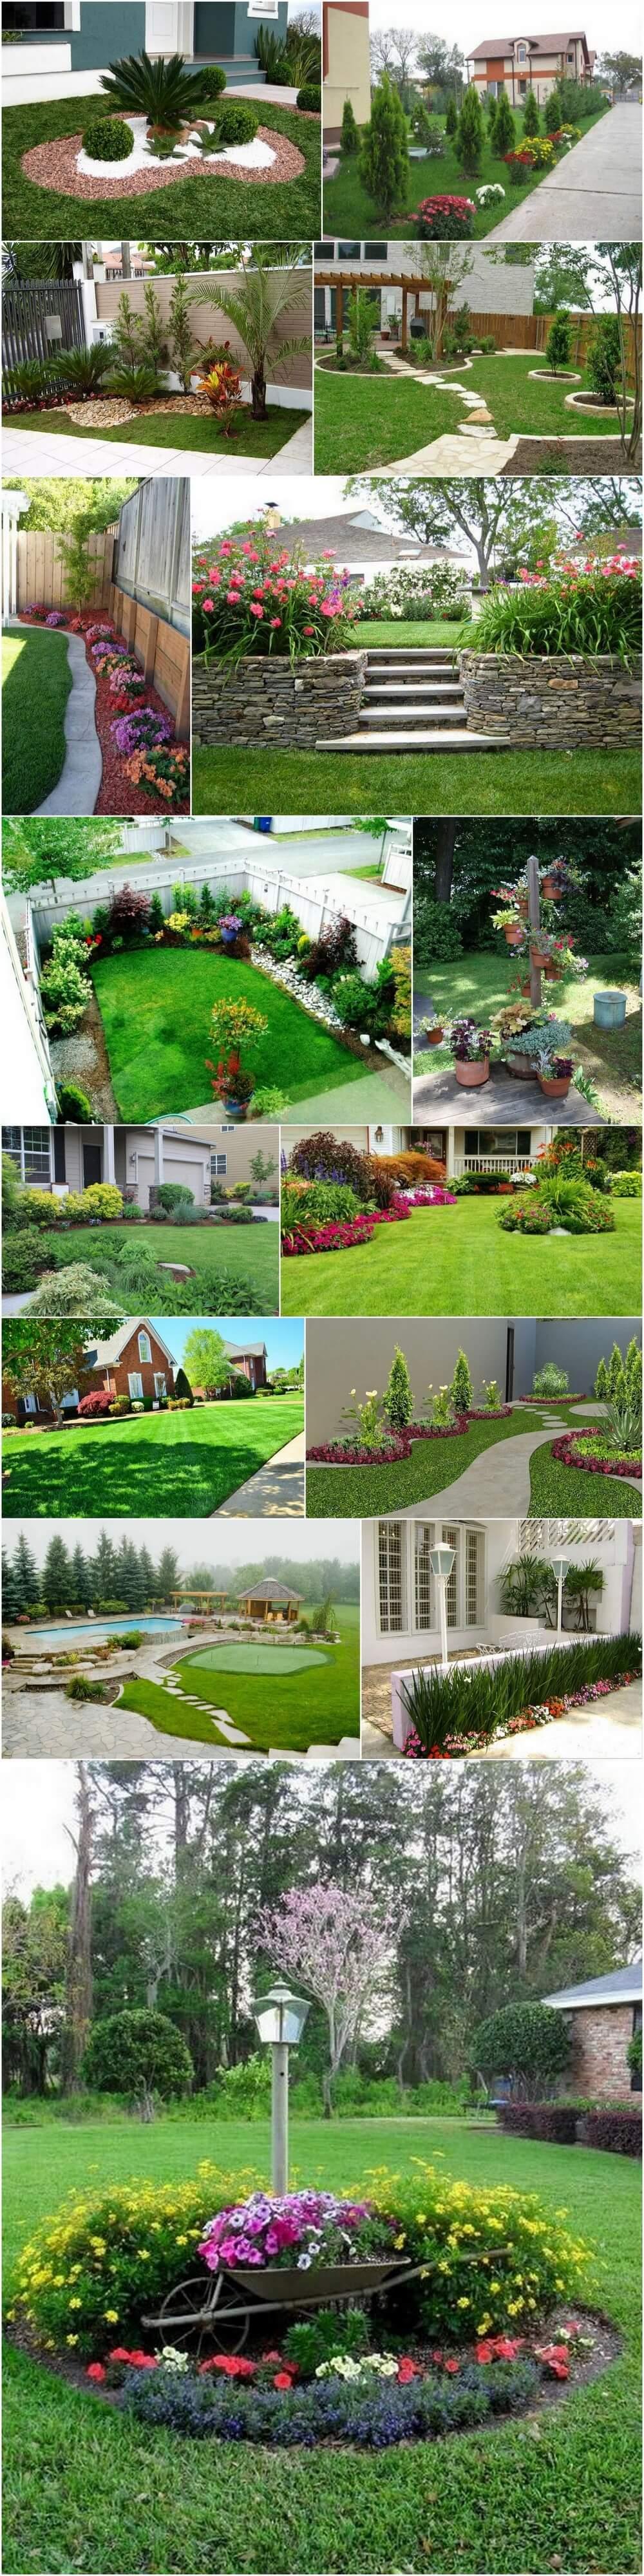 15 Beautiful Garden Ideas